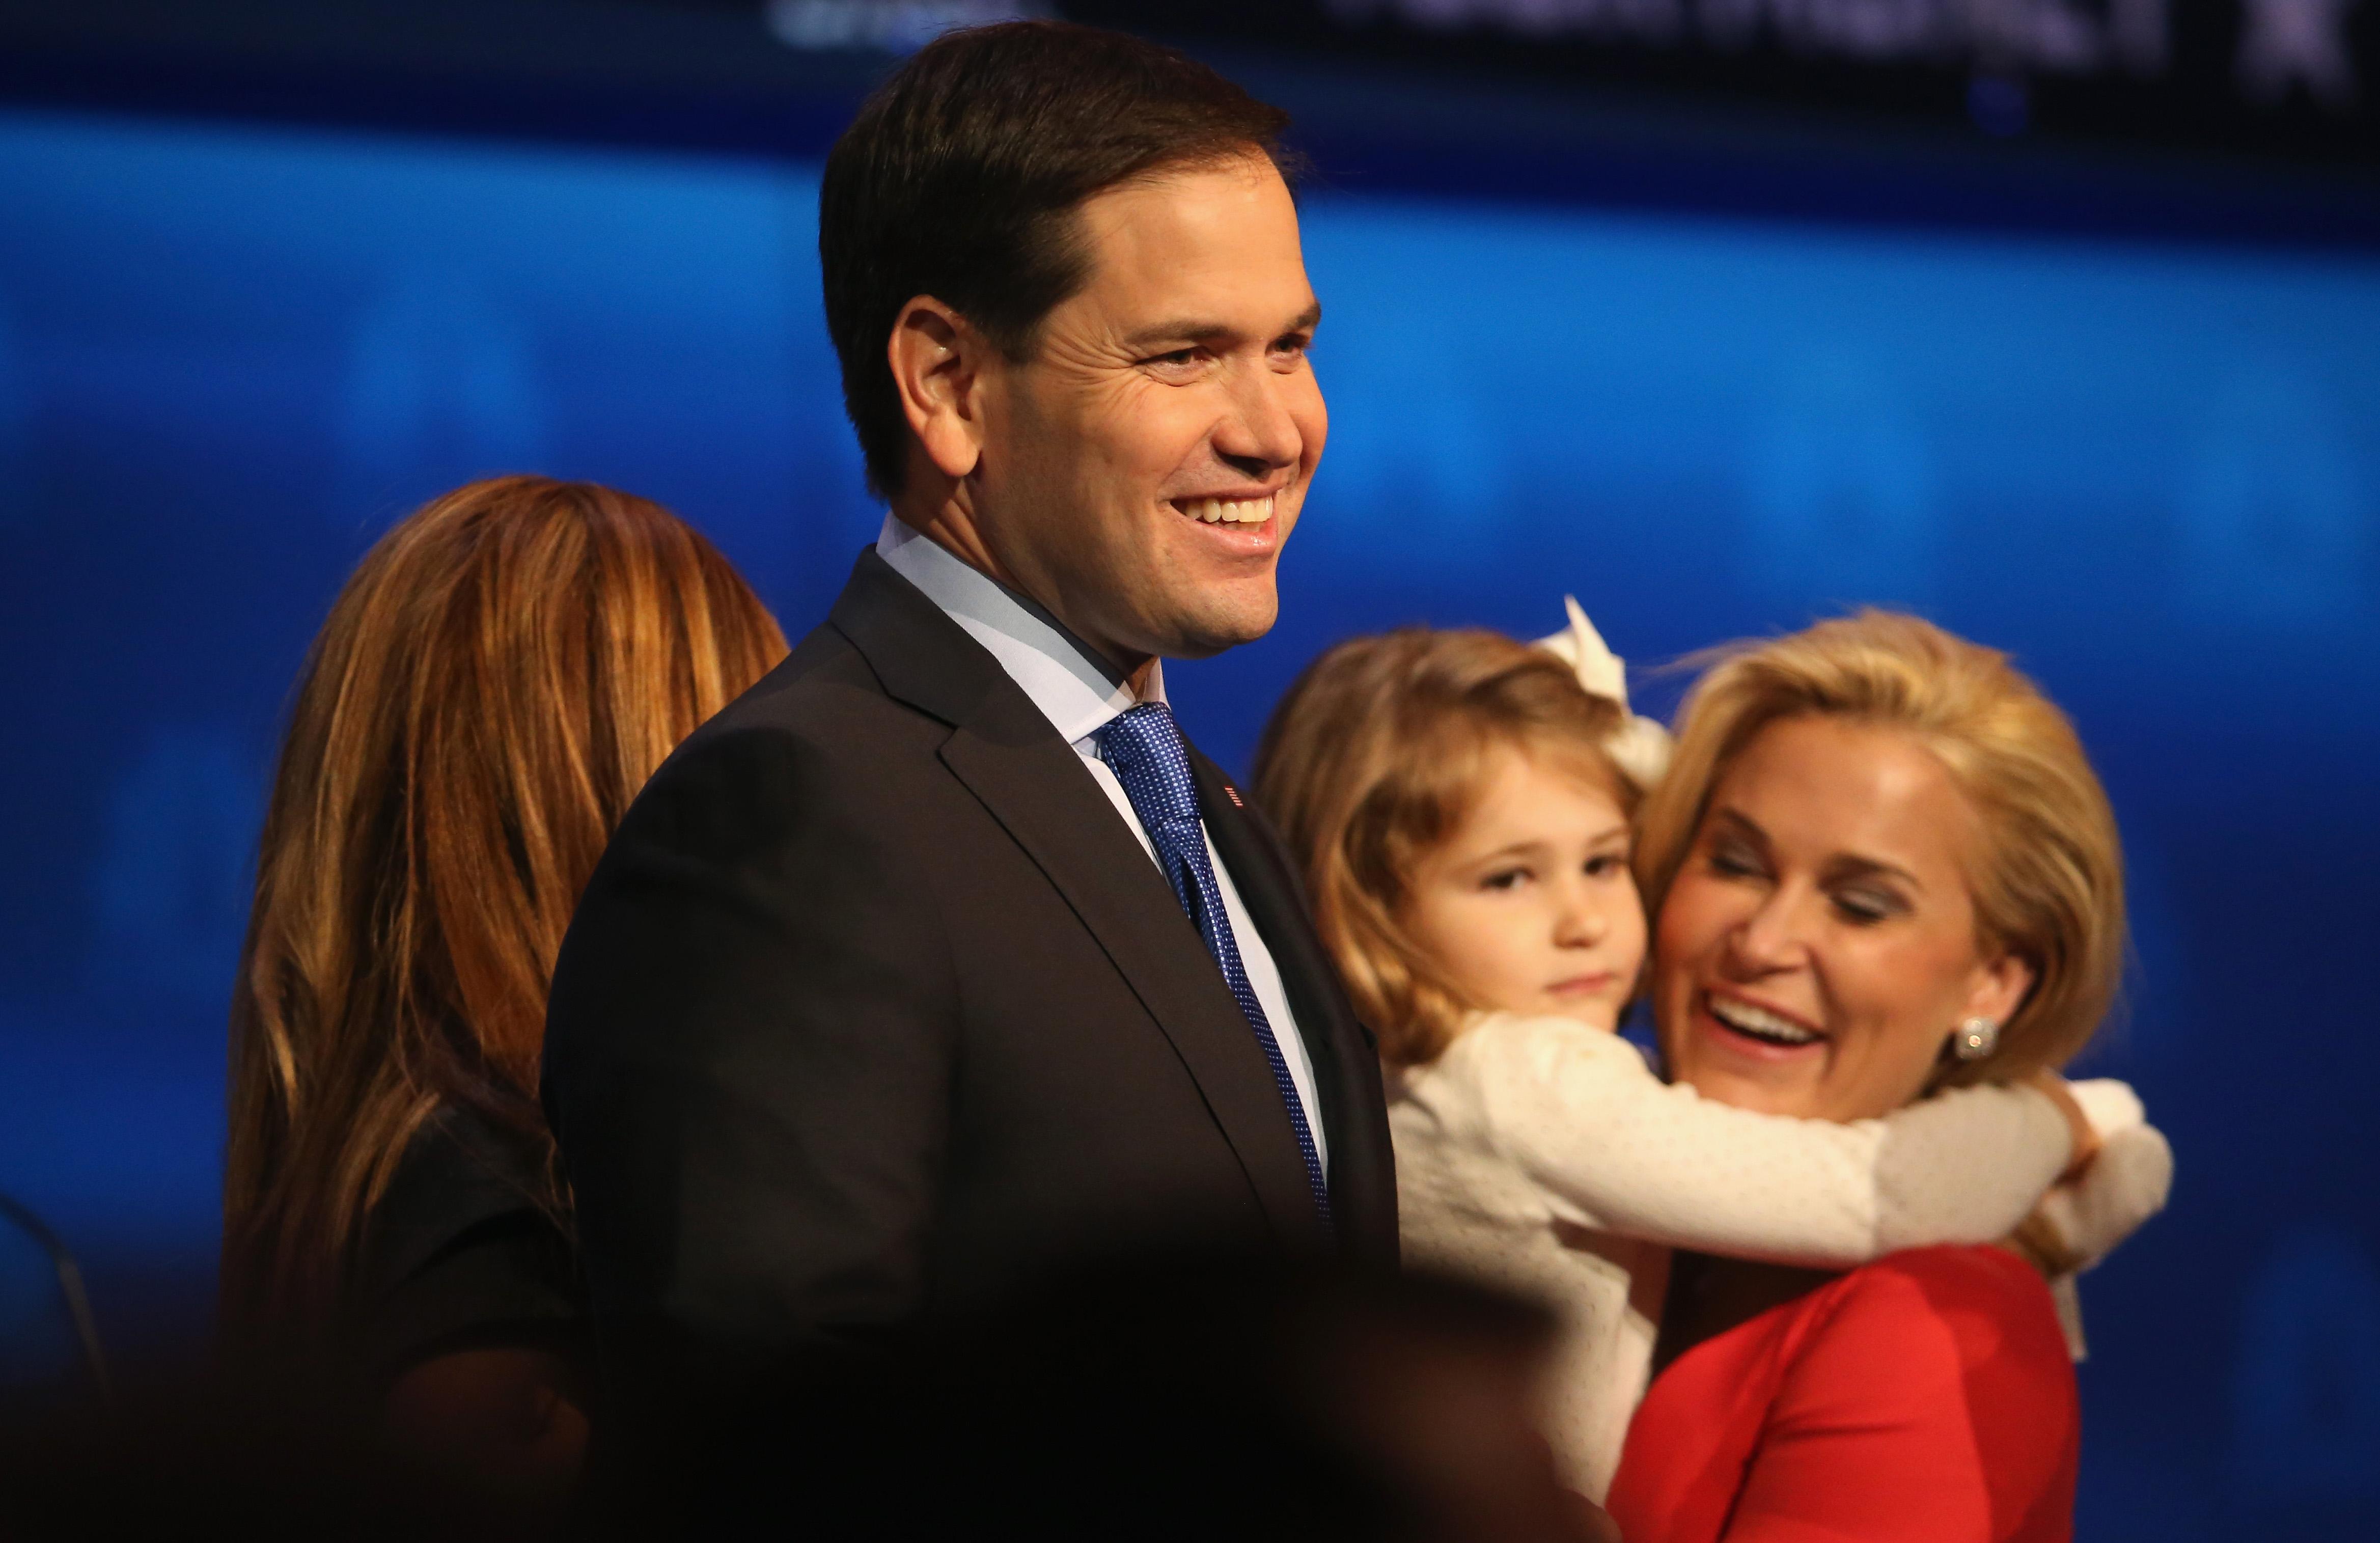 Rubio, smiling.